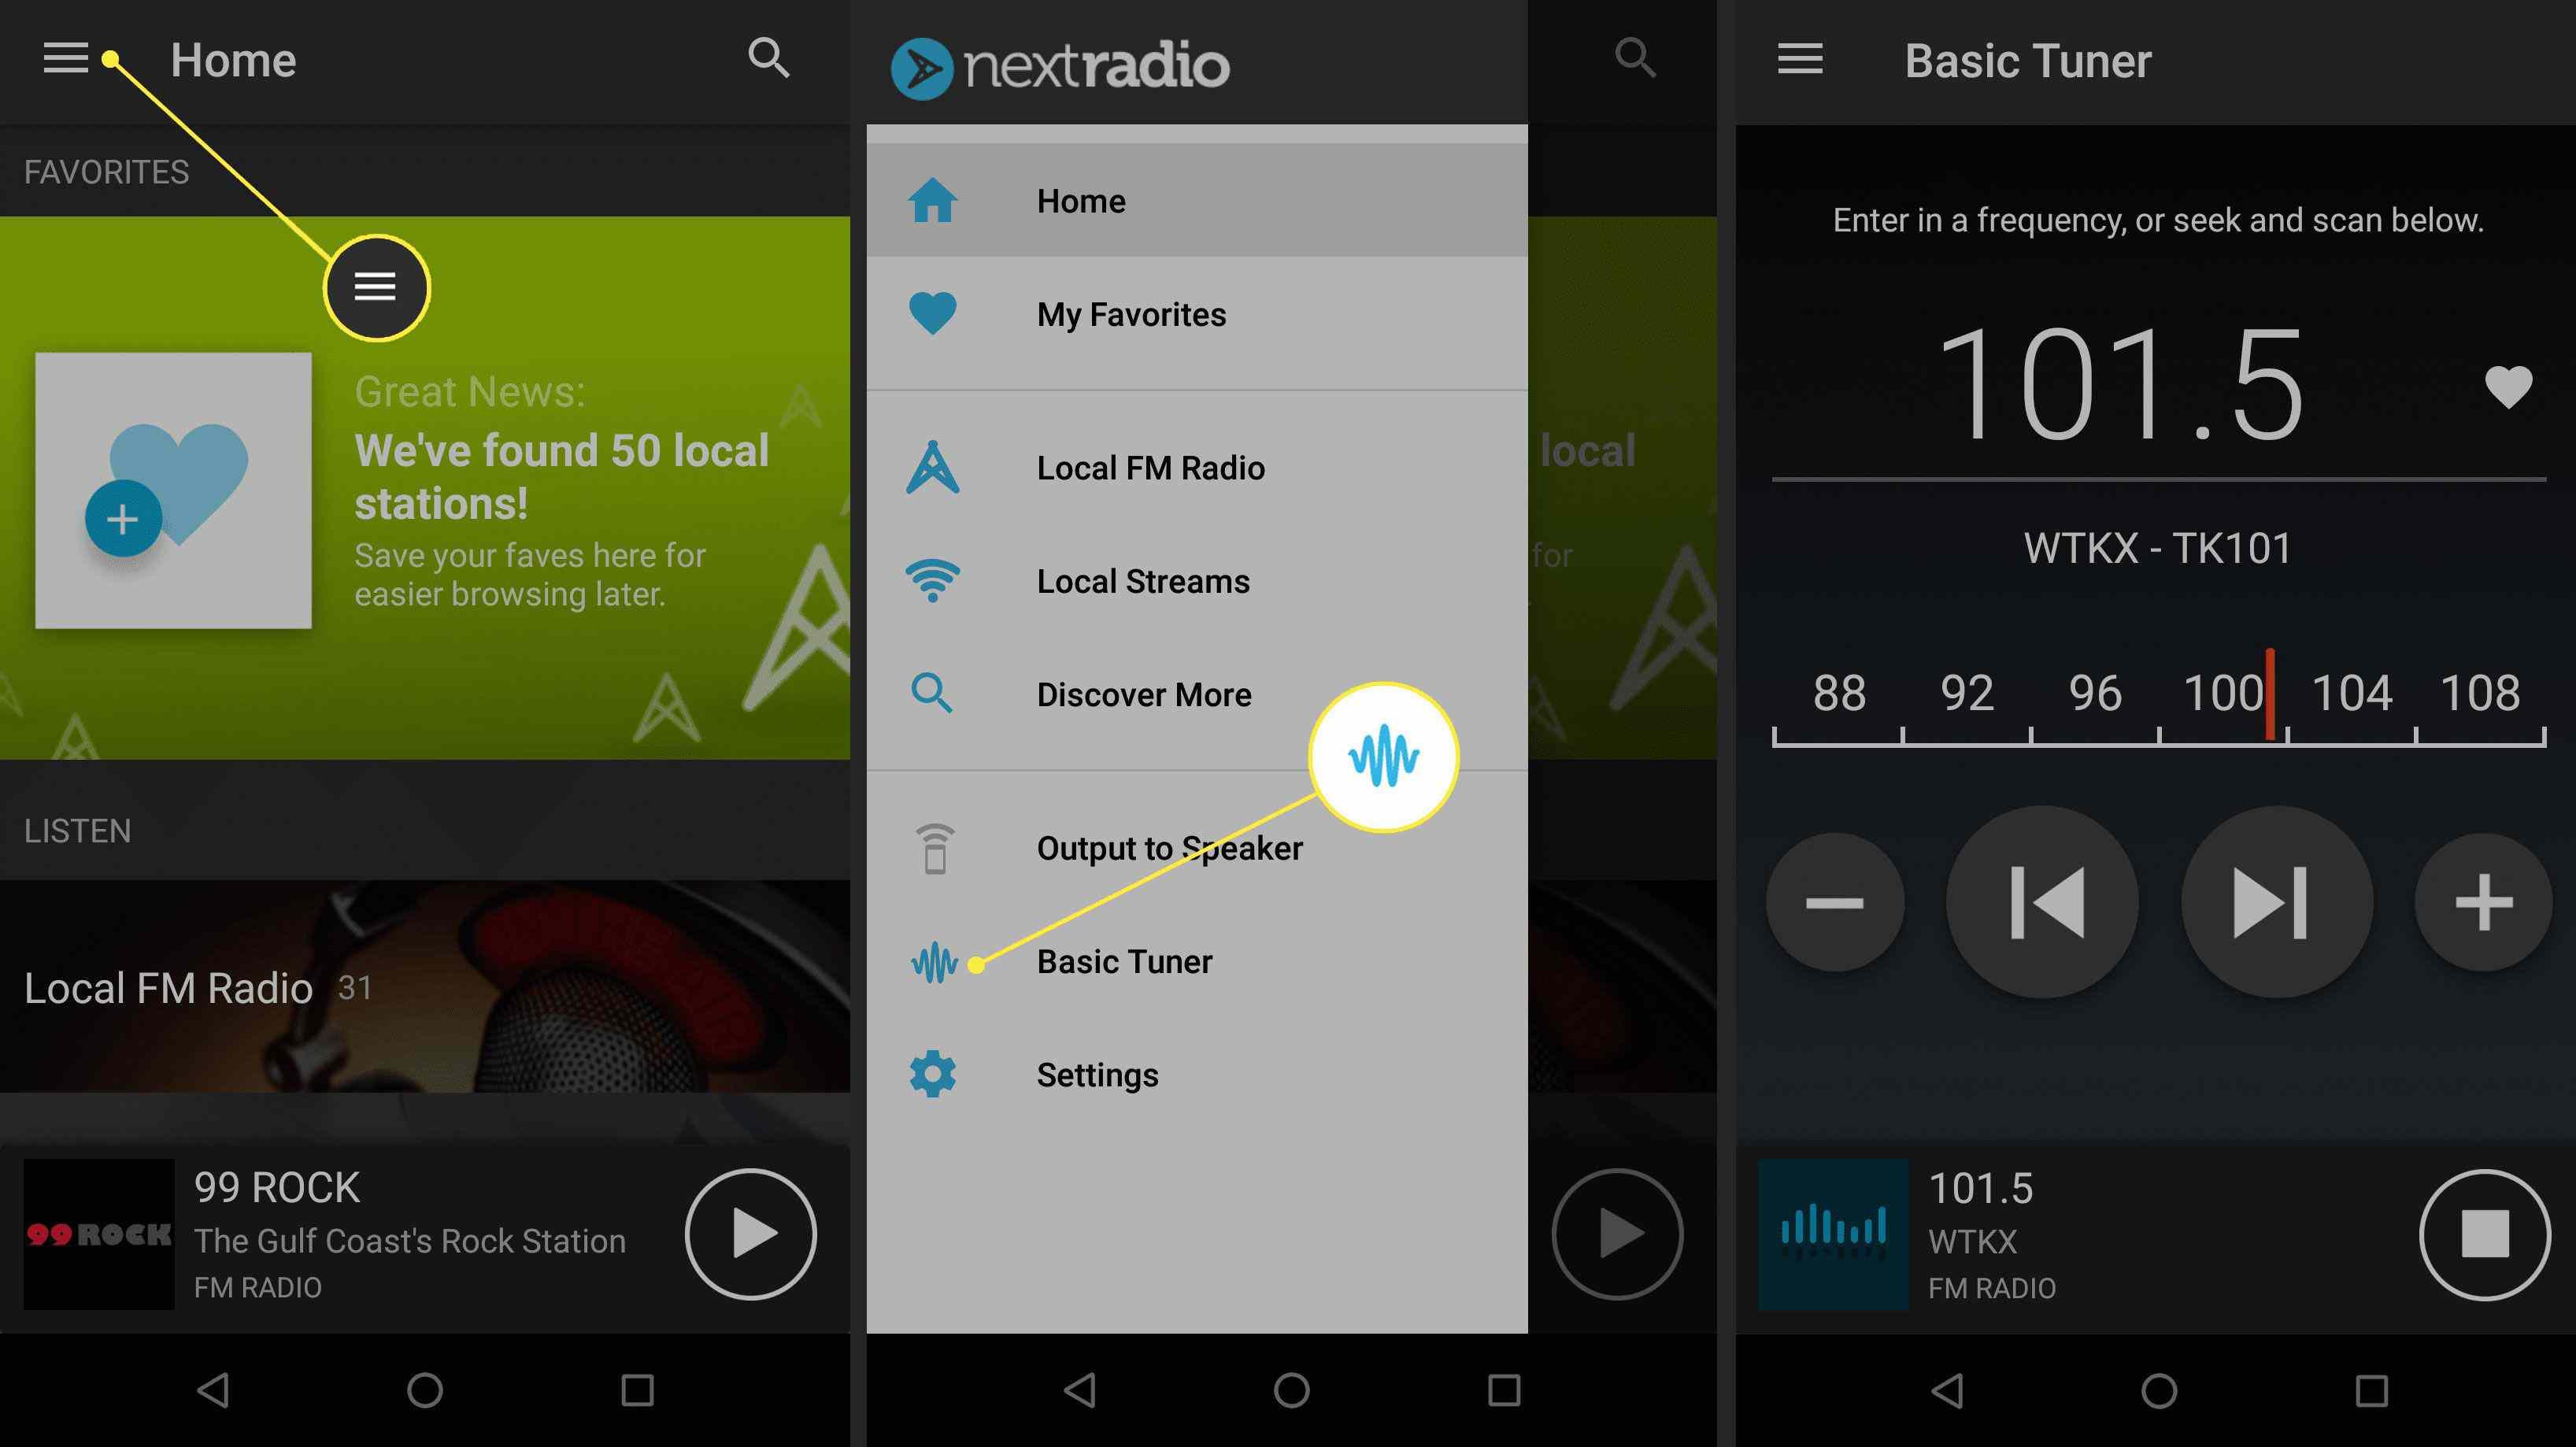 Basic Tuner in NextRadio